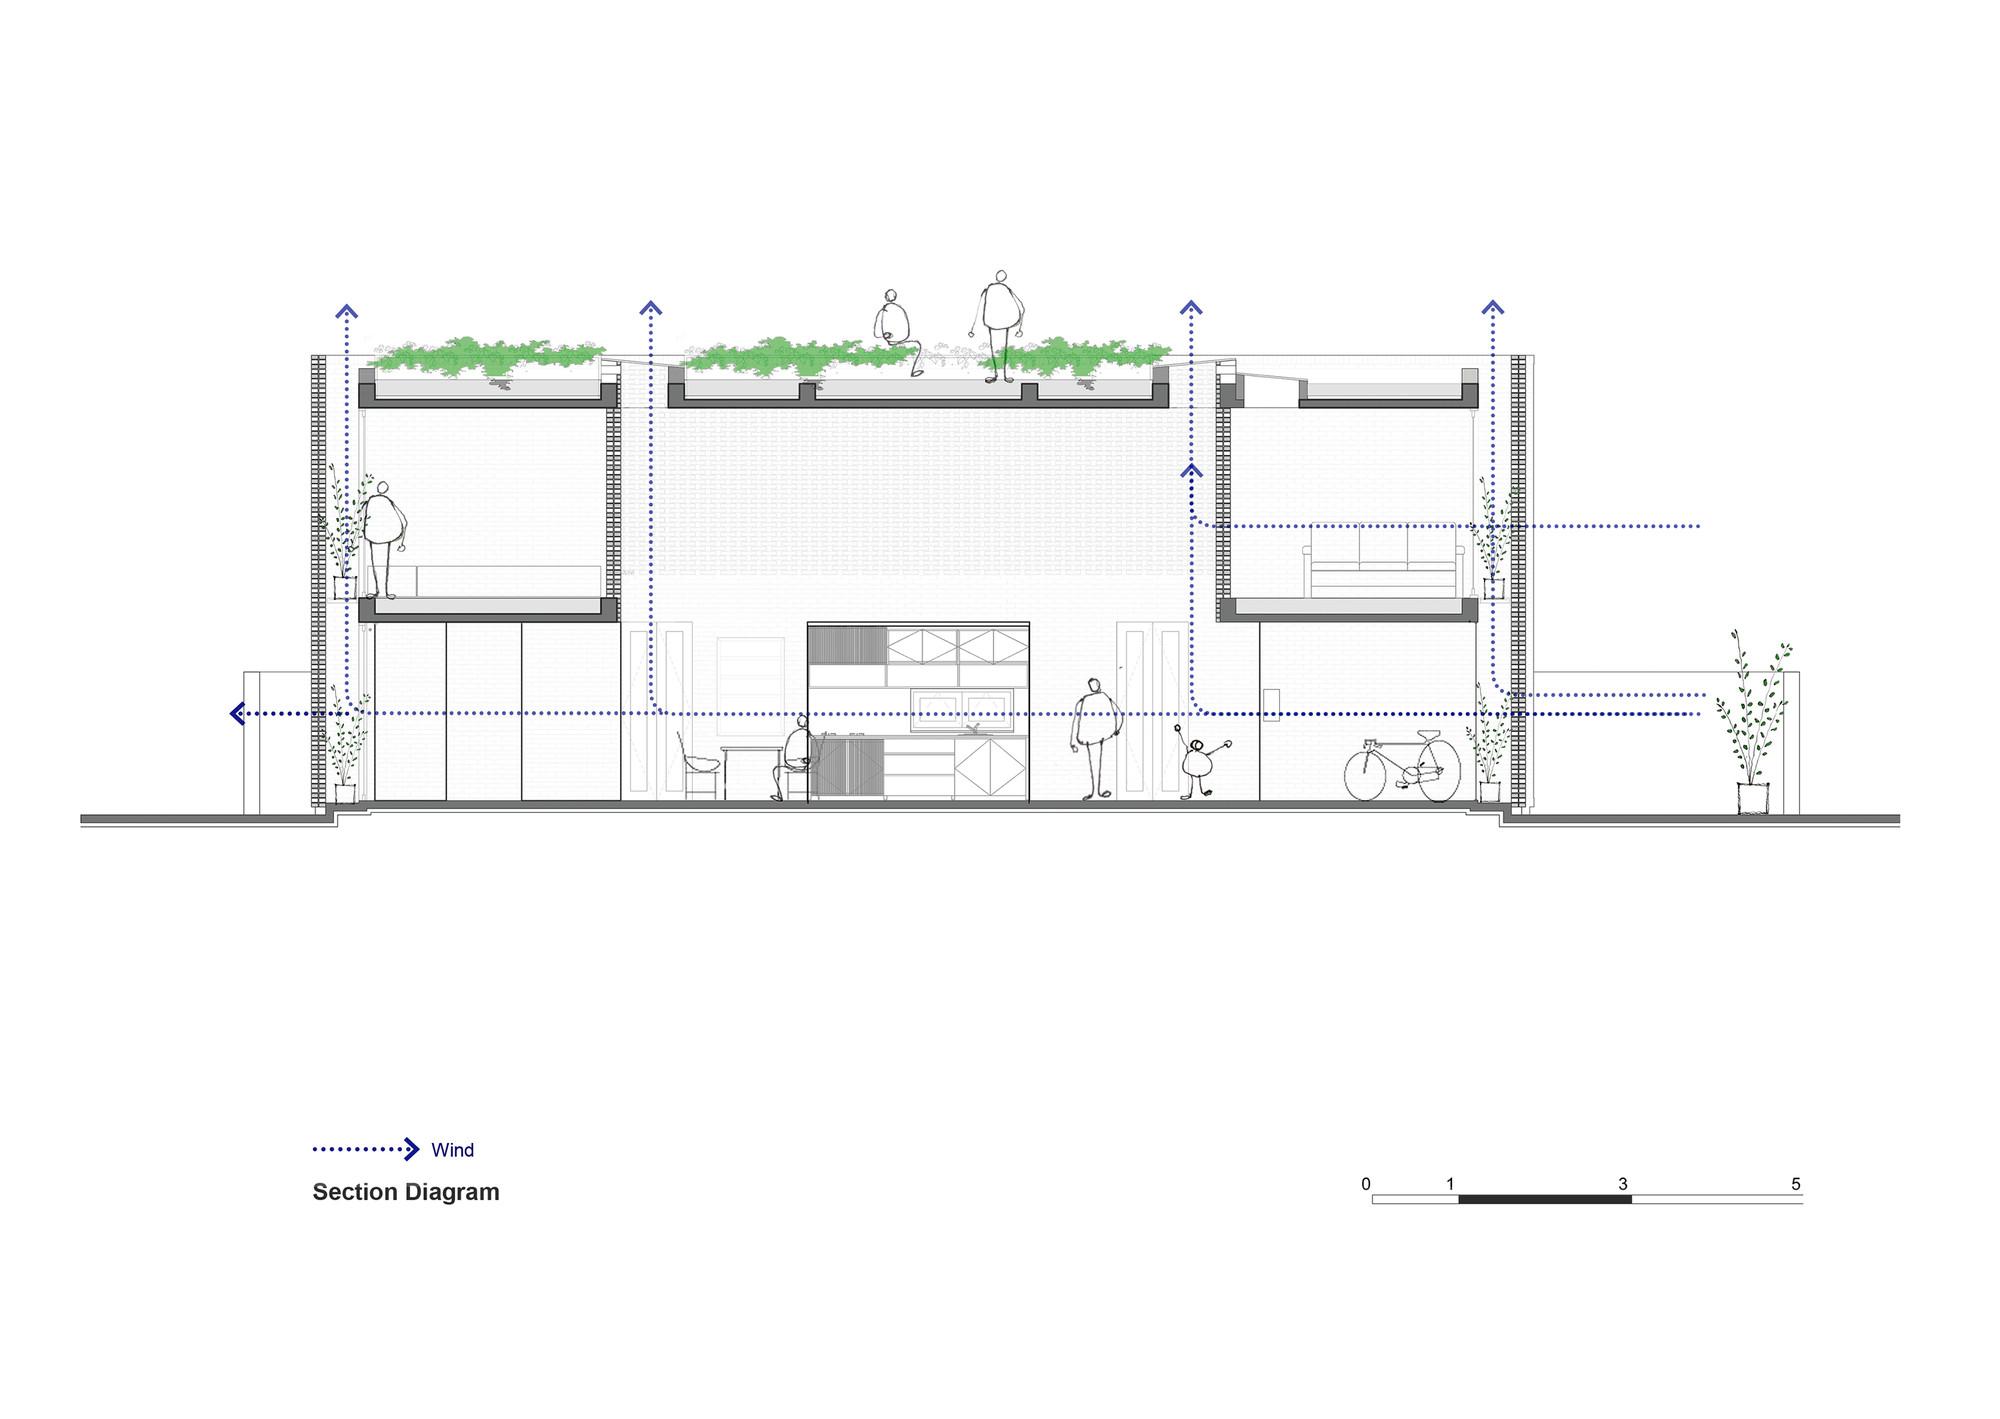 http://images.adsttc.com/media/images/54d0/64f9/e58e/ce45/7a00/04b7/large_jpg/Section_Diagram.jpg?1422943462